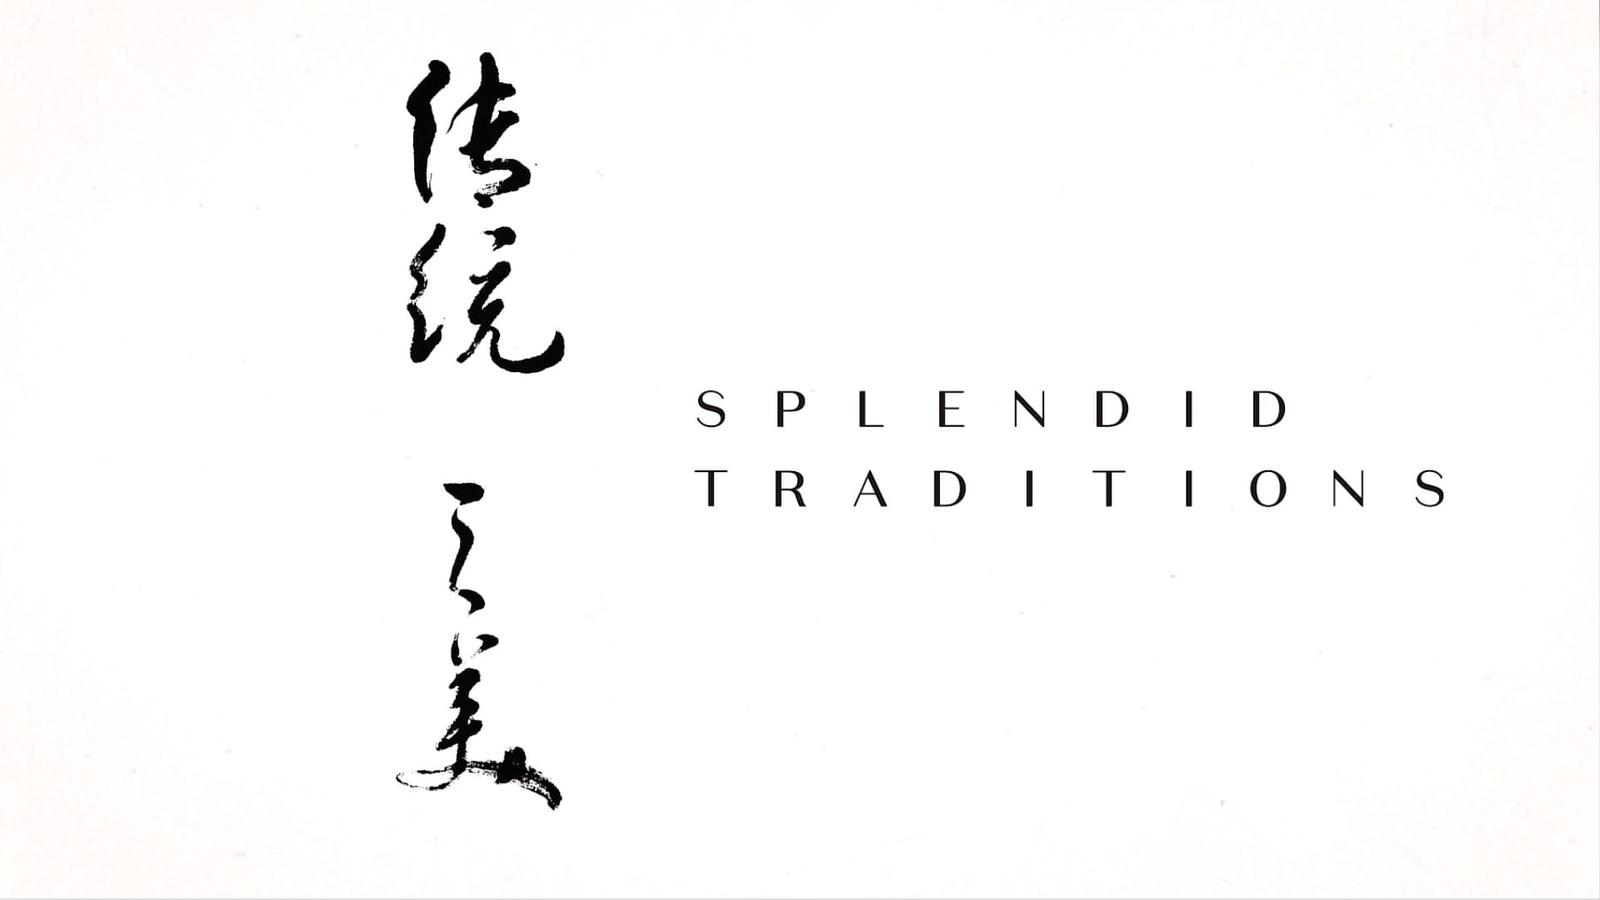 Splendid Traditions